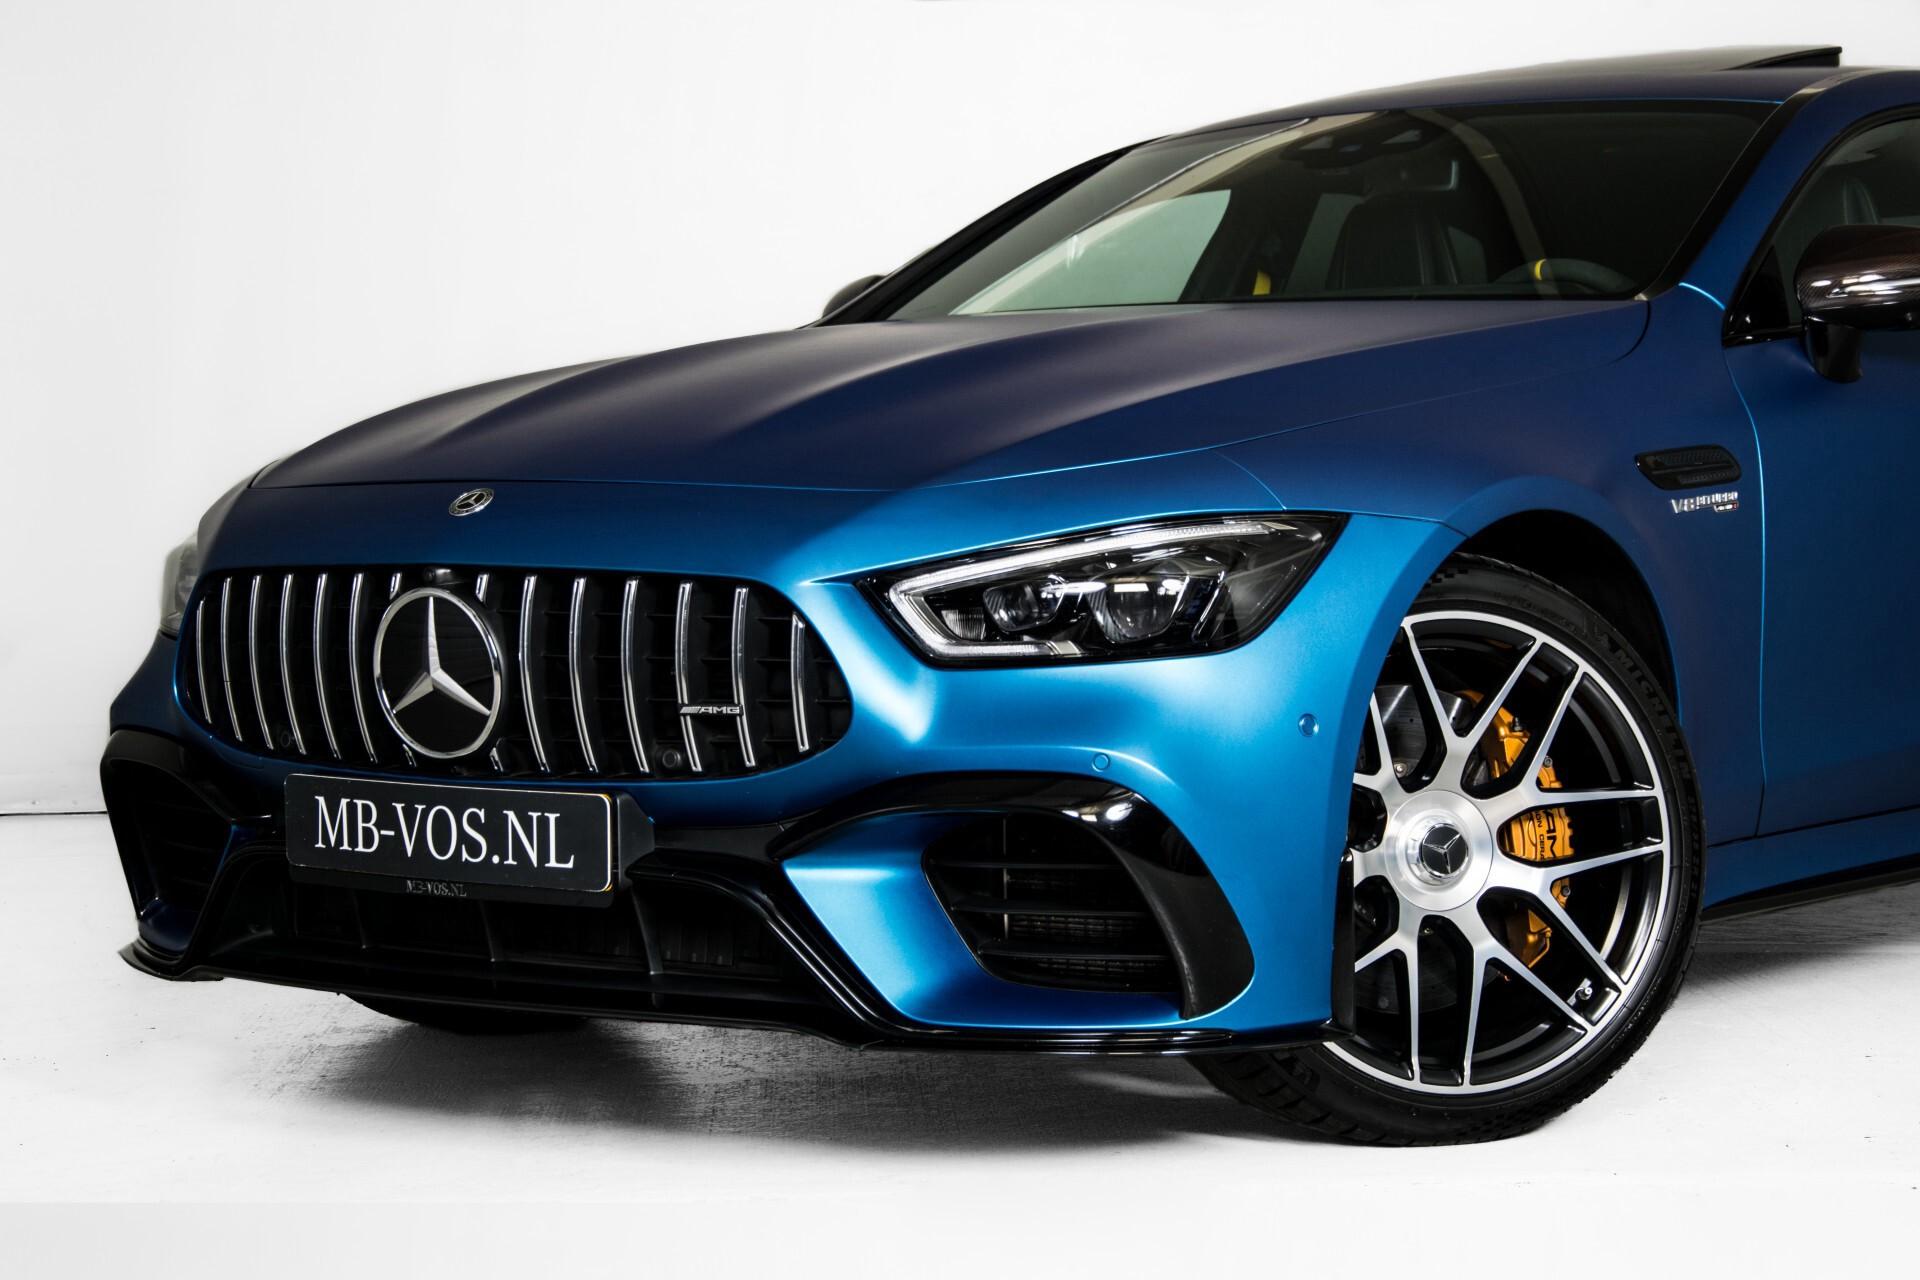 Mercedes-Benz AMG GT 4-Door Coupe 63 S 4MATIC+ Edition 1 Keramisch/Carbon/First Class/Dynamic Plus/Burmester High End 3D Aut9 Foto 90